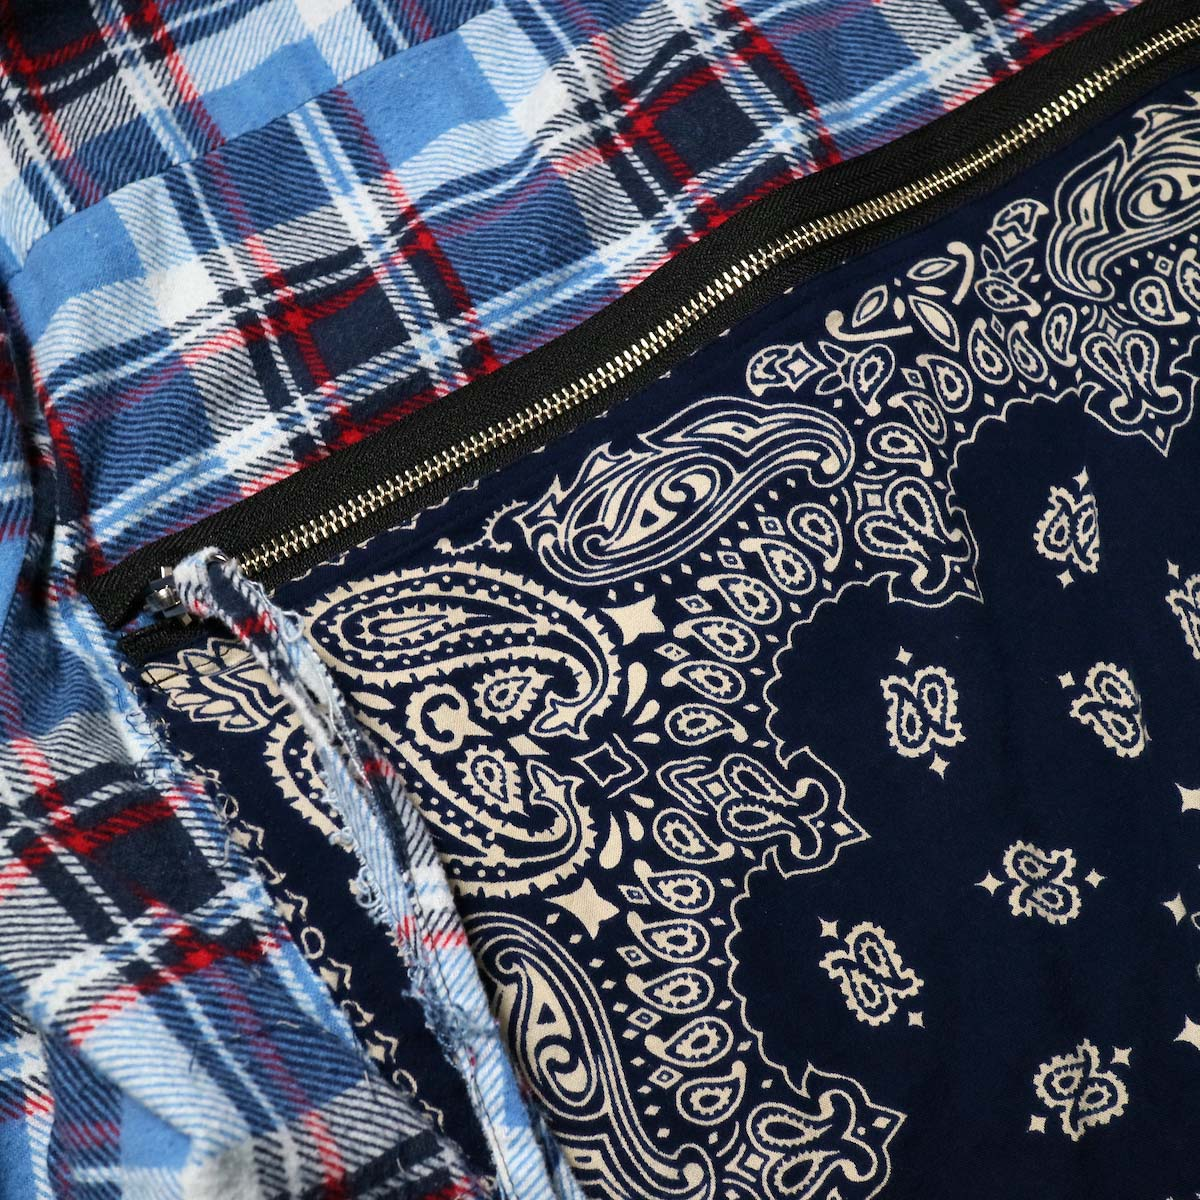 OLD PARK / Bandana Bag Shirt Flannel (B)背面